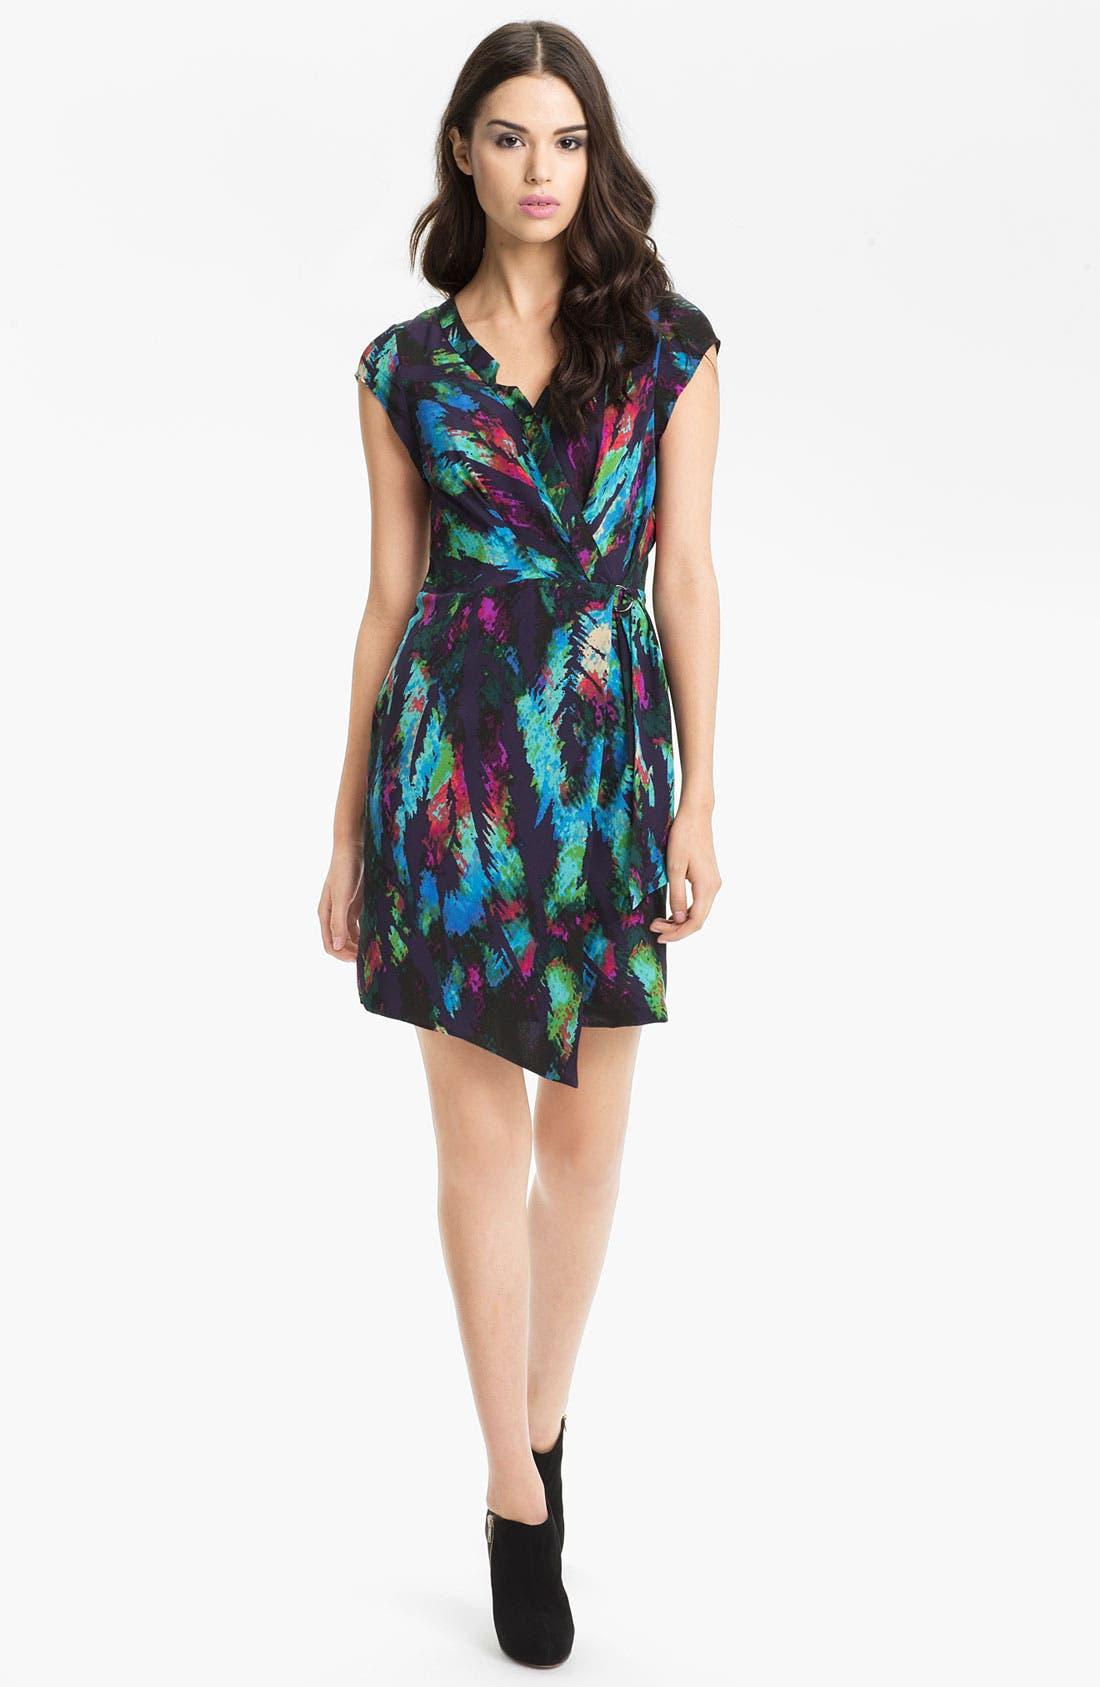 Main Image - Presley Skye 'Hannah' Print Faux Wrap Silk Dress